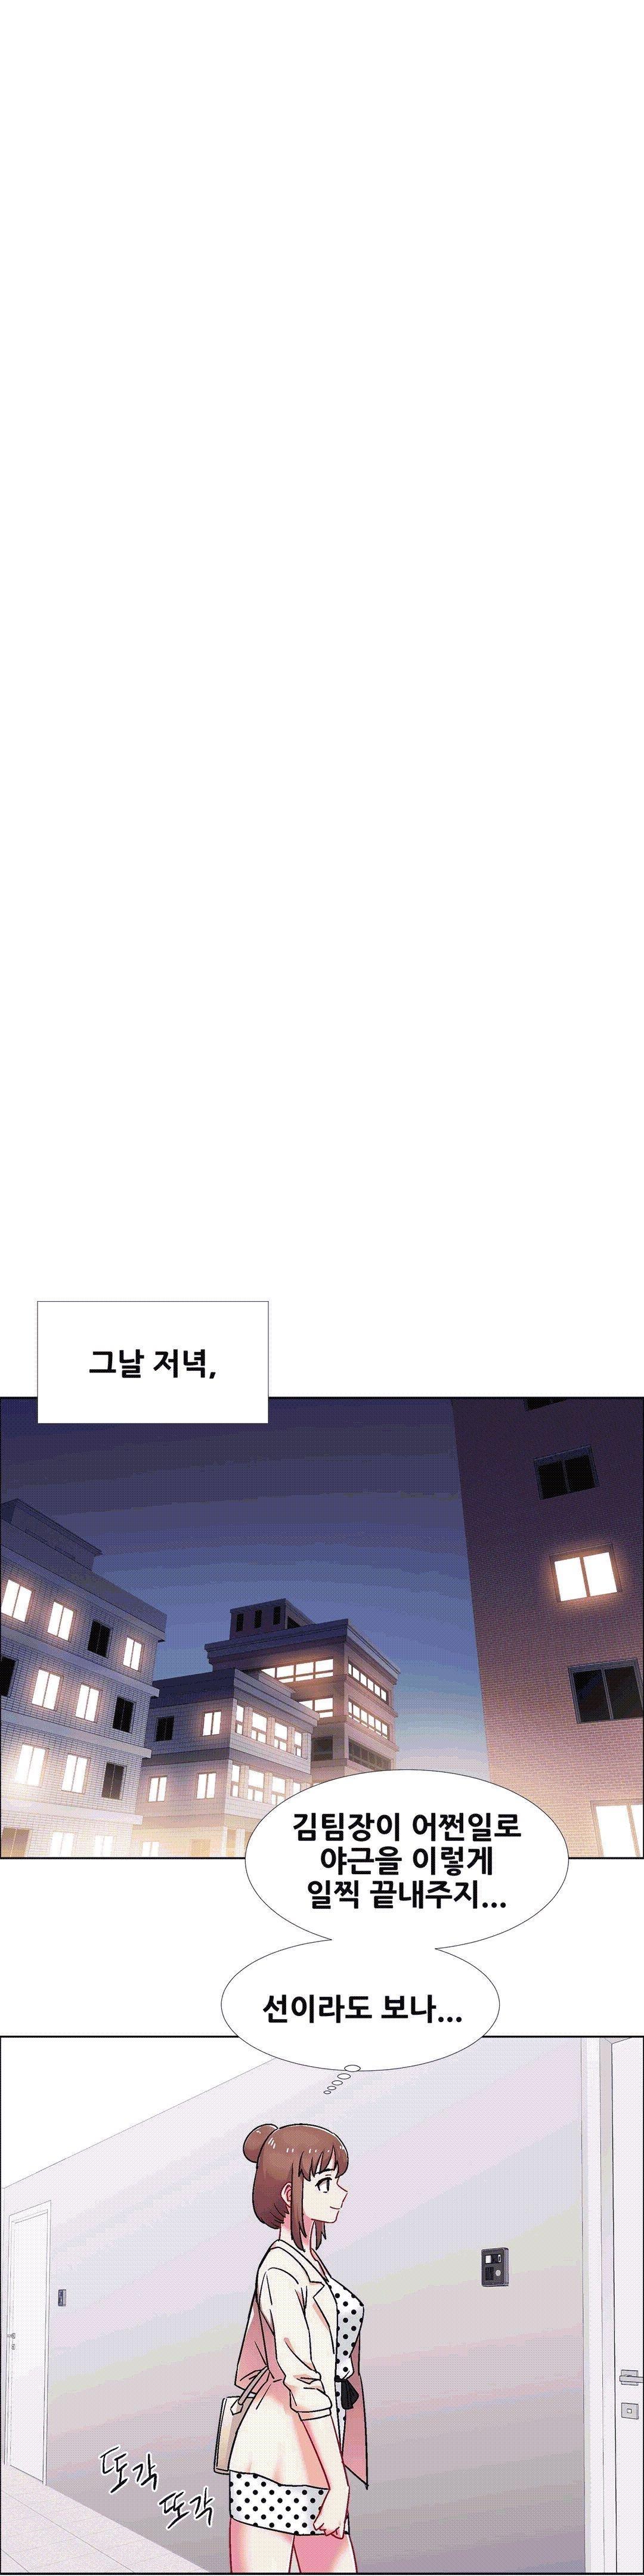 [Studio Wannabe] Rental Girls | 出租女郎 Ch. 33-58 [Chinese]  第二季 完结 637